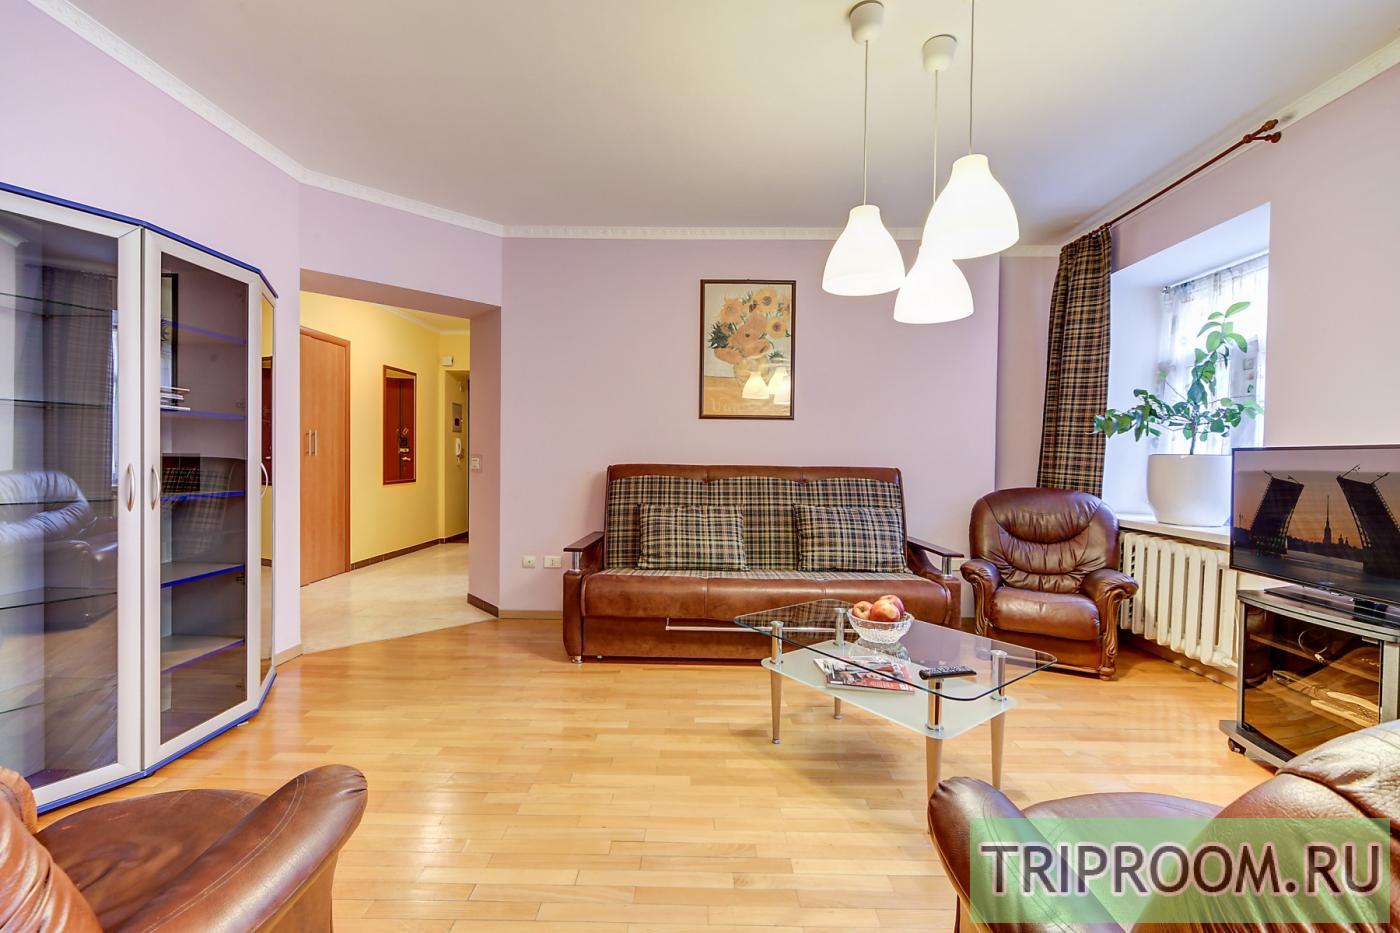 2-комнатная квартира посуточно (вариант № 20143), ул. Невский проспект, фото № 4